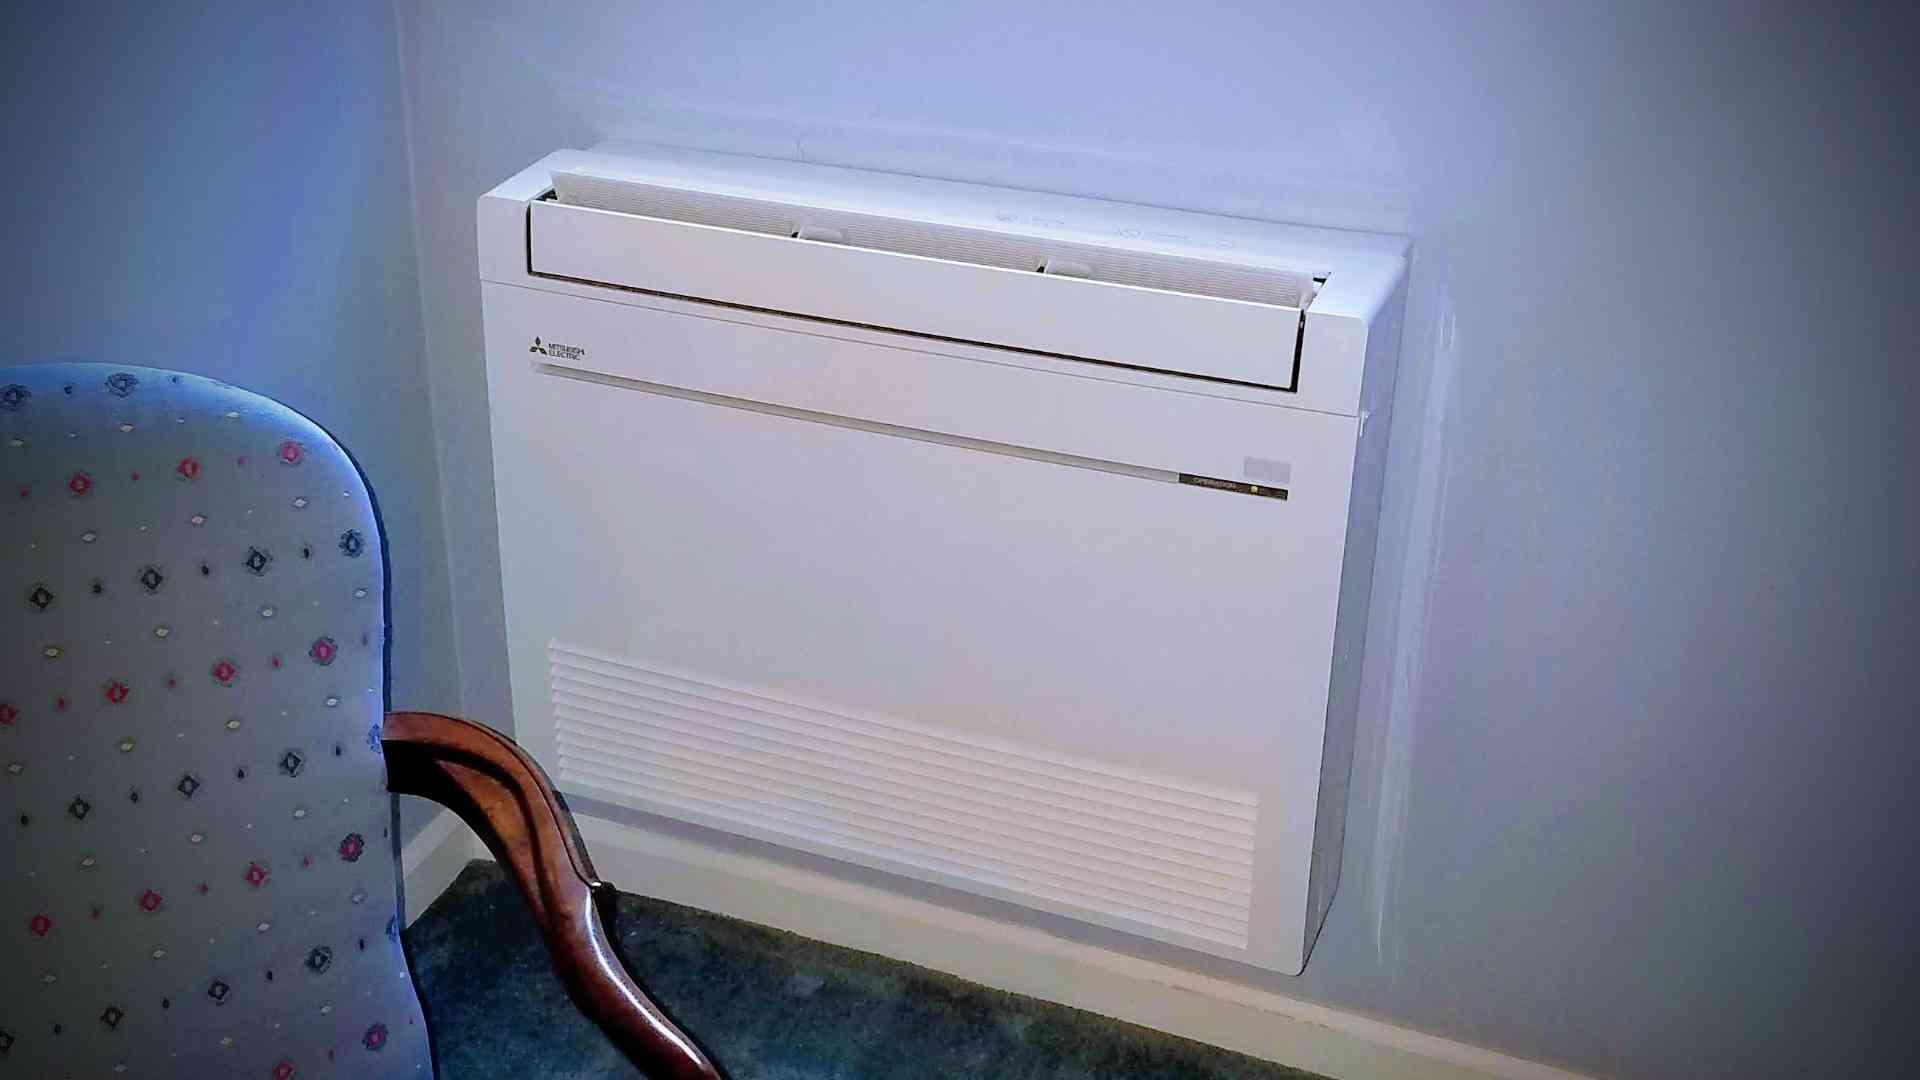 Mitsubishi Heat Pump Floor Console